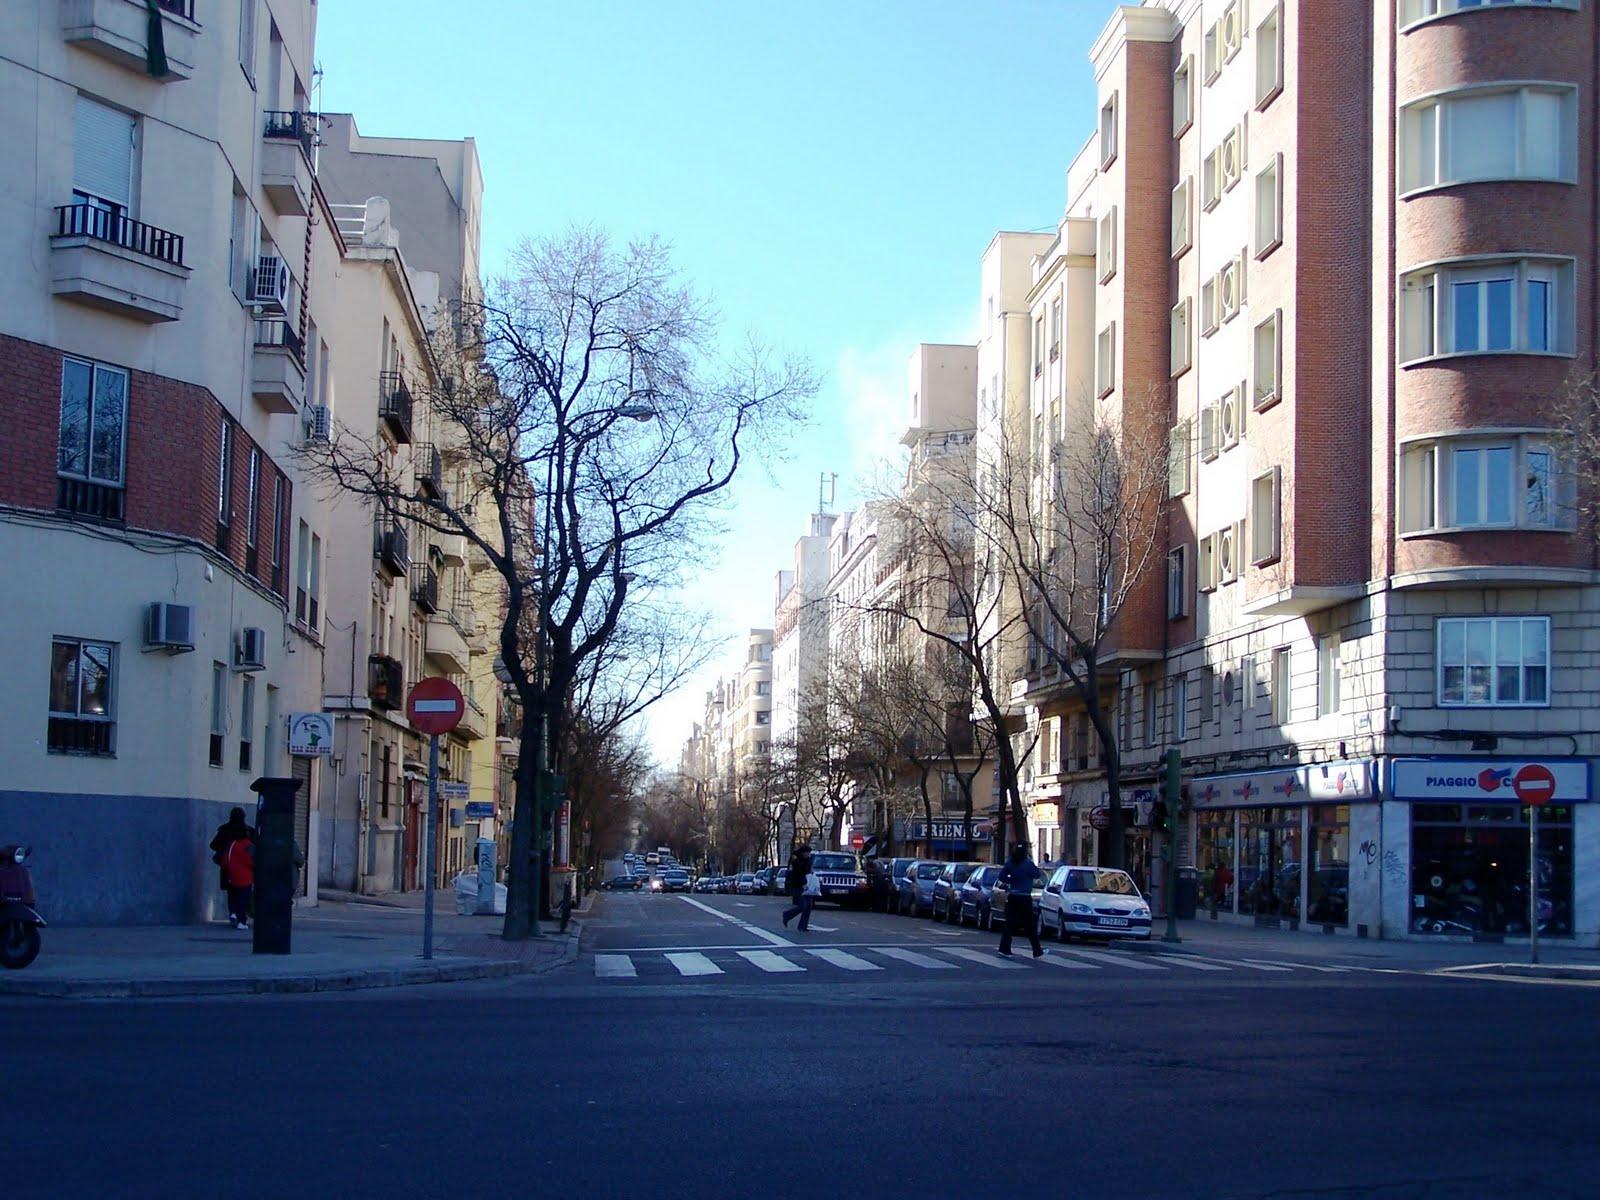 Rizal's Madrid